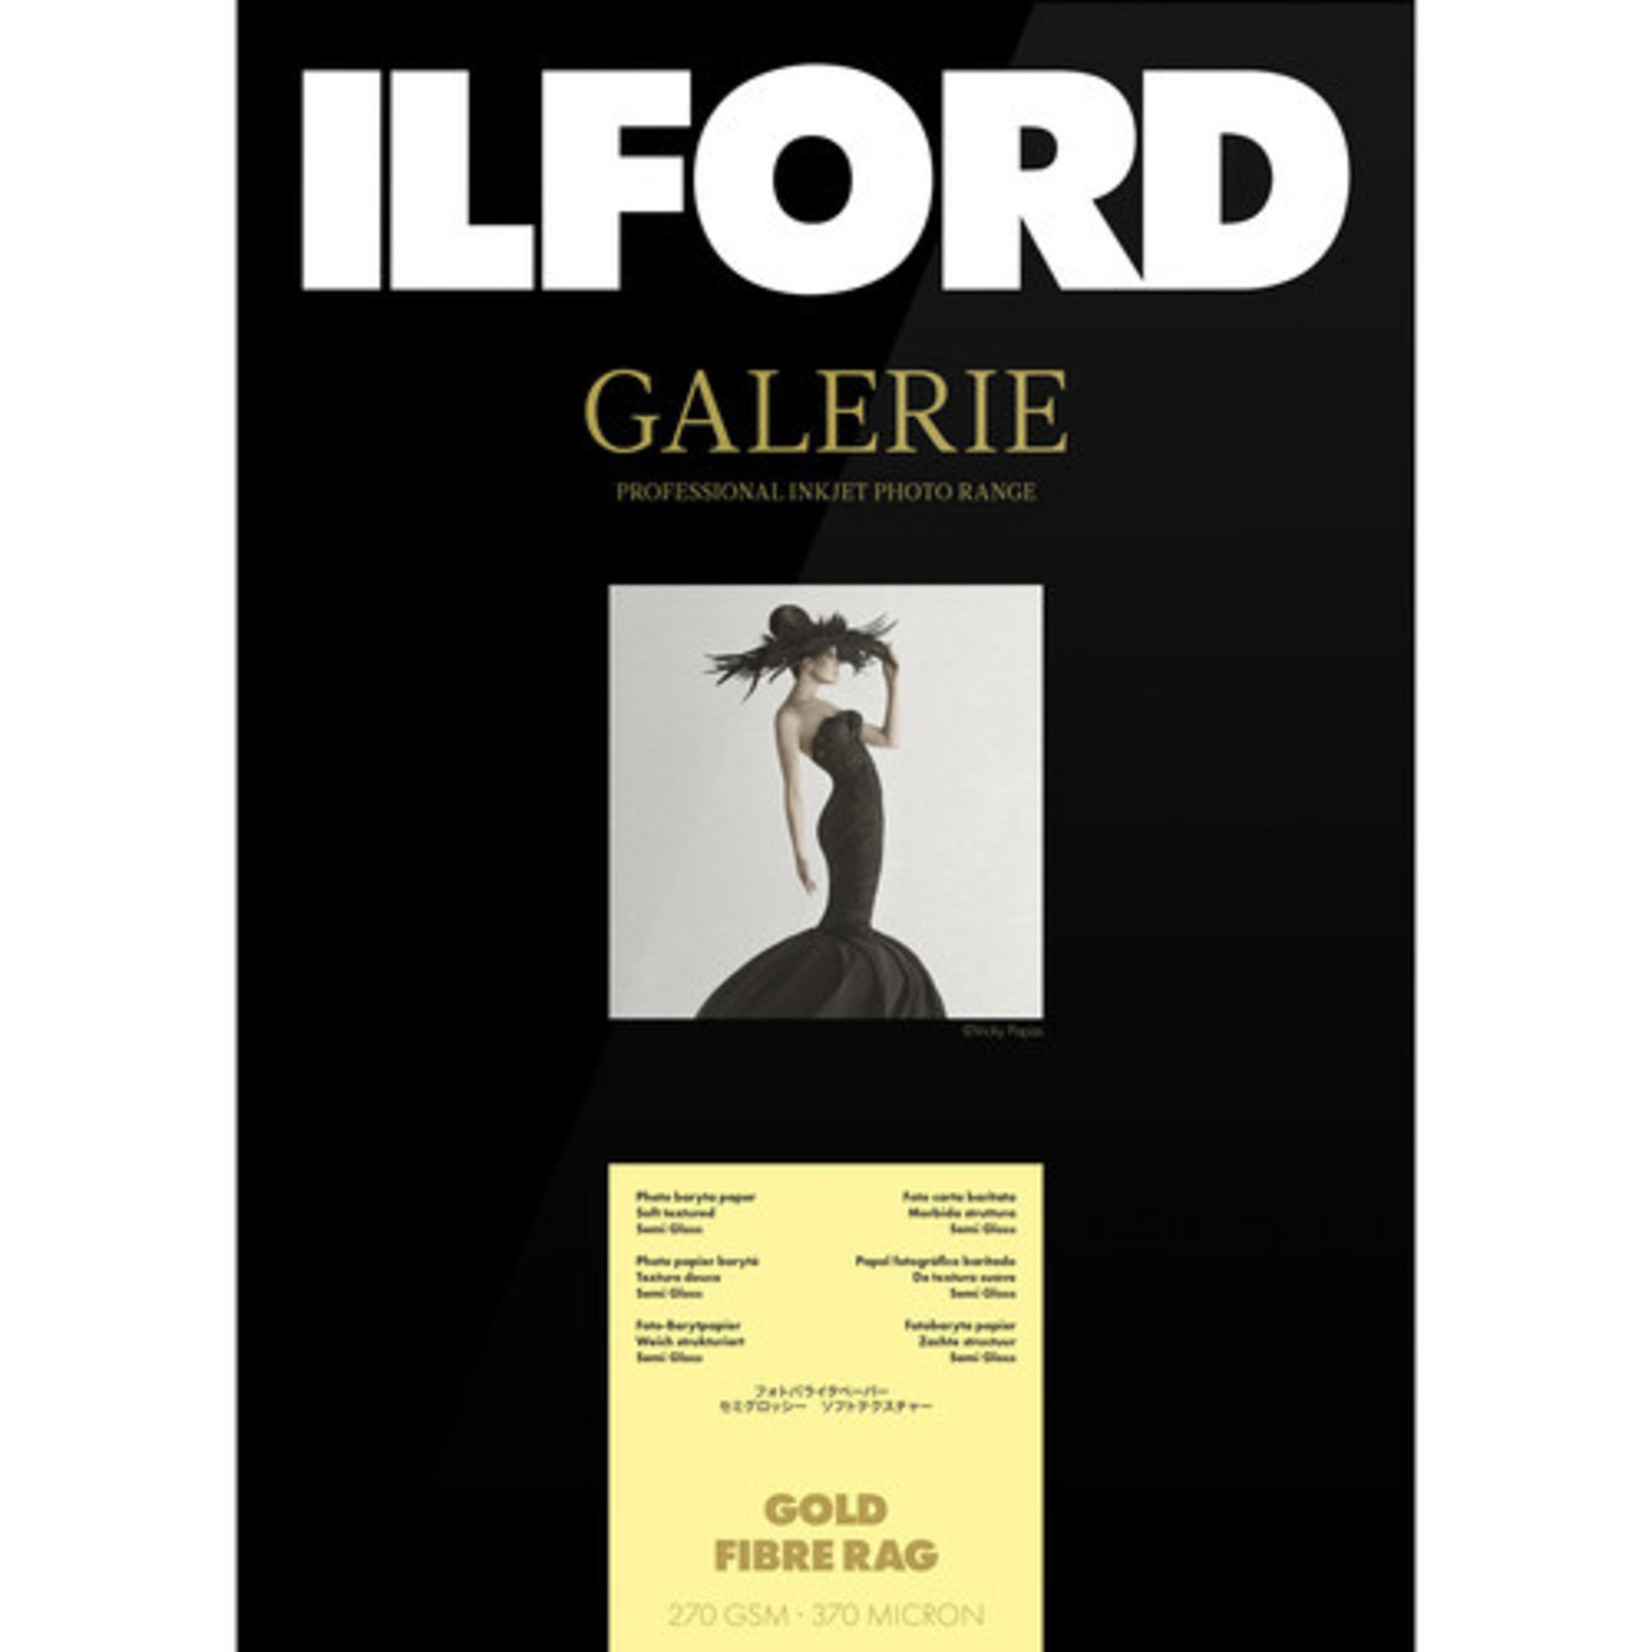 Ilford Galerie Gold Fibre Rag A3+13x19 (25 PK)